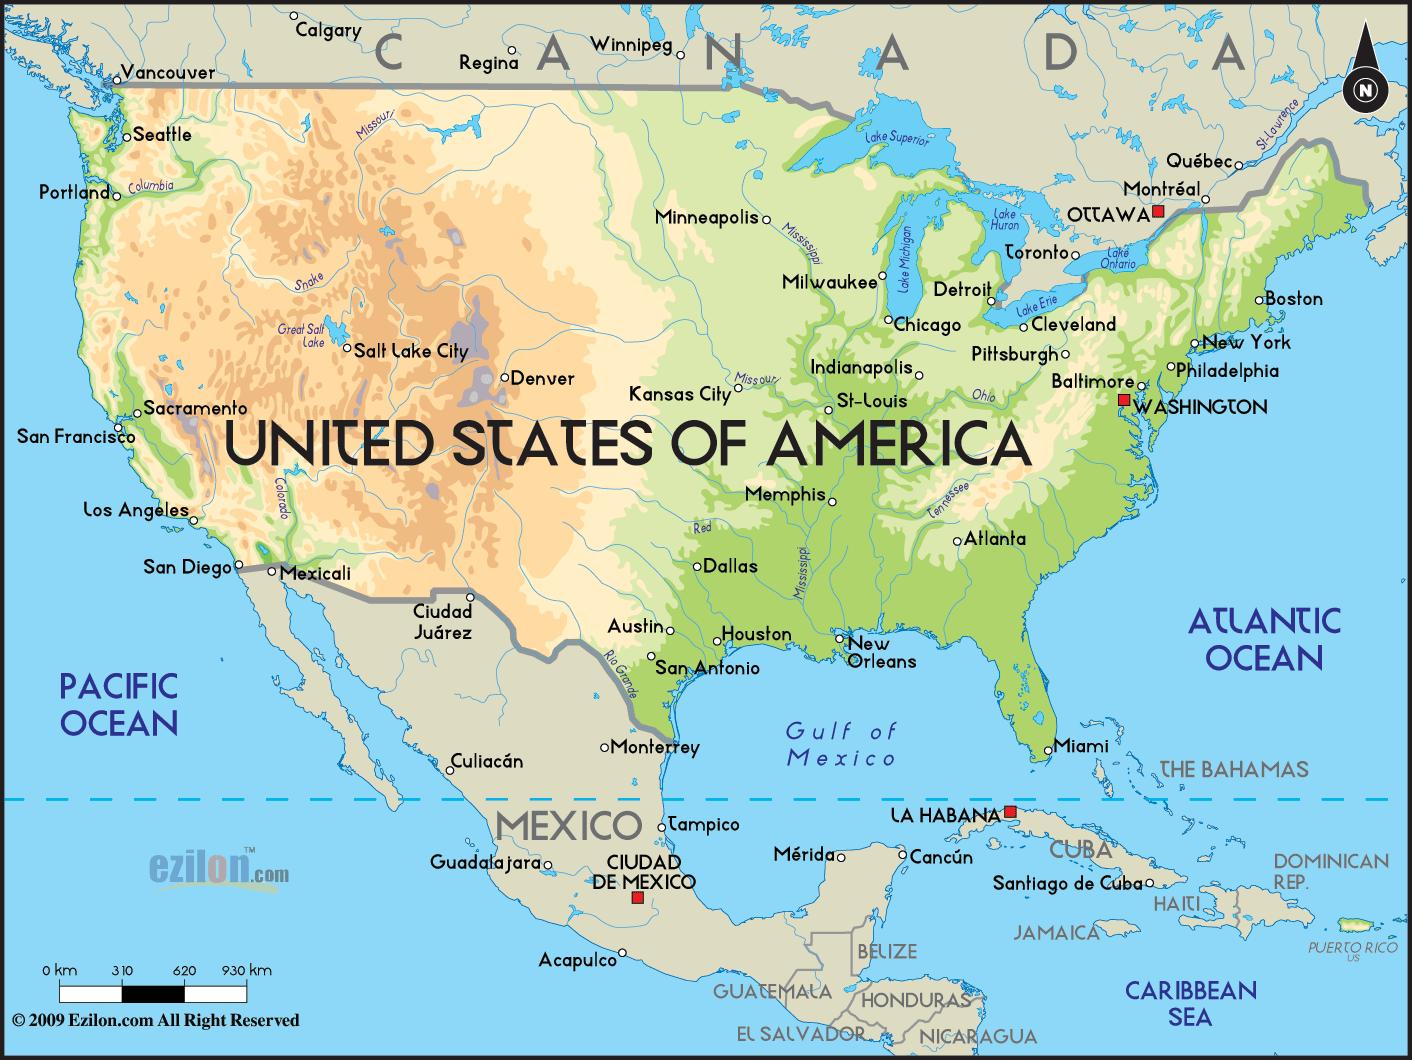 Amerika Karte Staaten.Karte Von Amerika Die Staaten Map Staaten Von Amerika